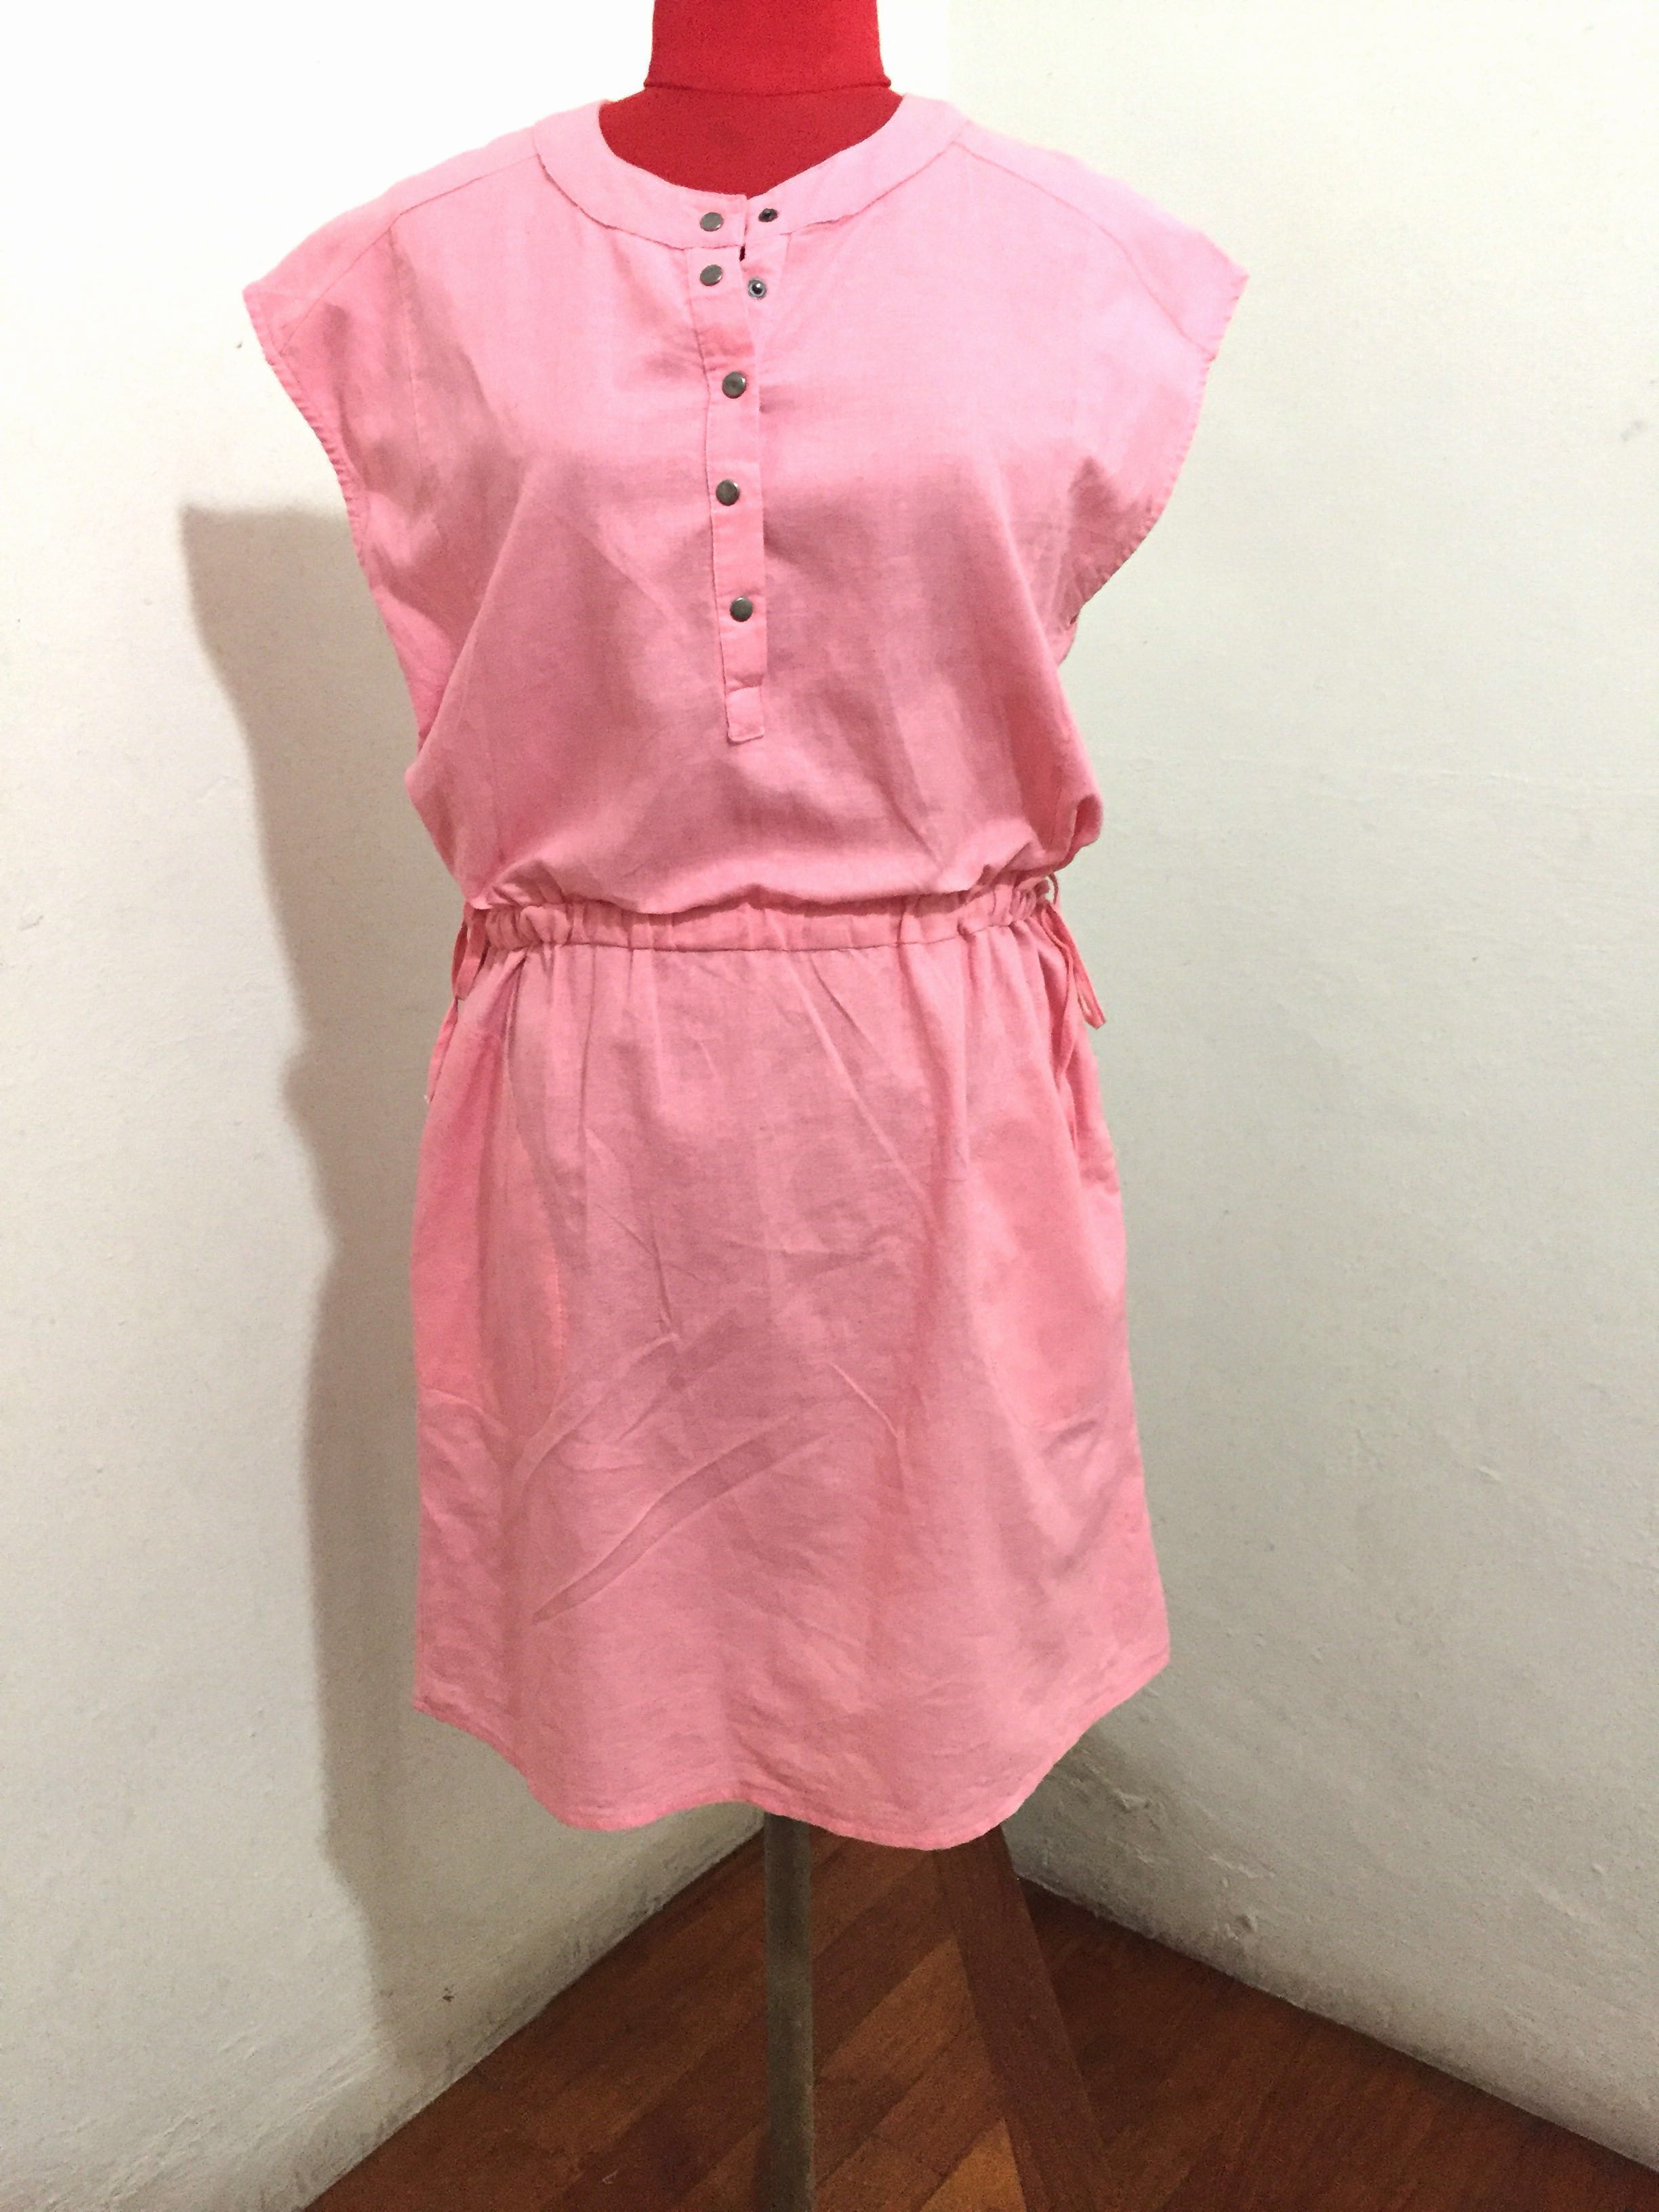 2968567c1703fa Pink sleeveless button down dress